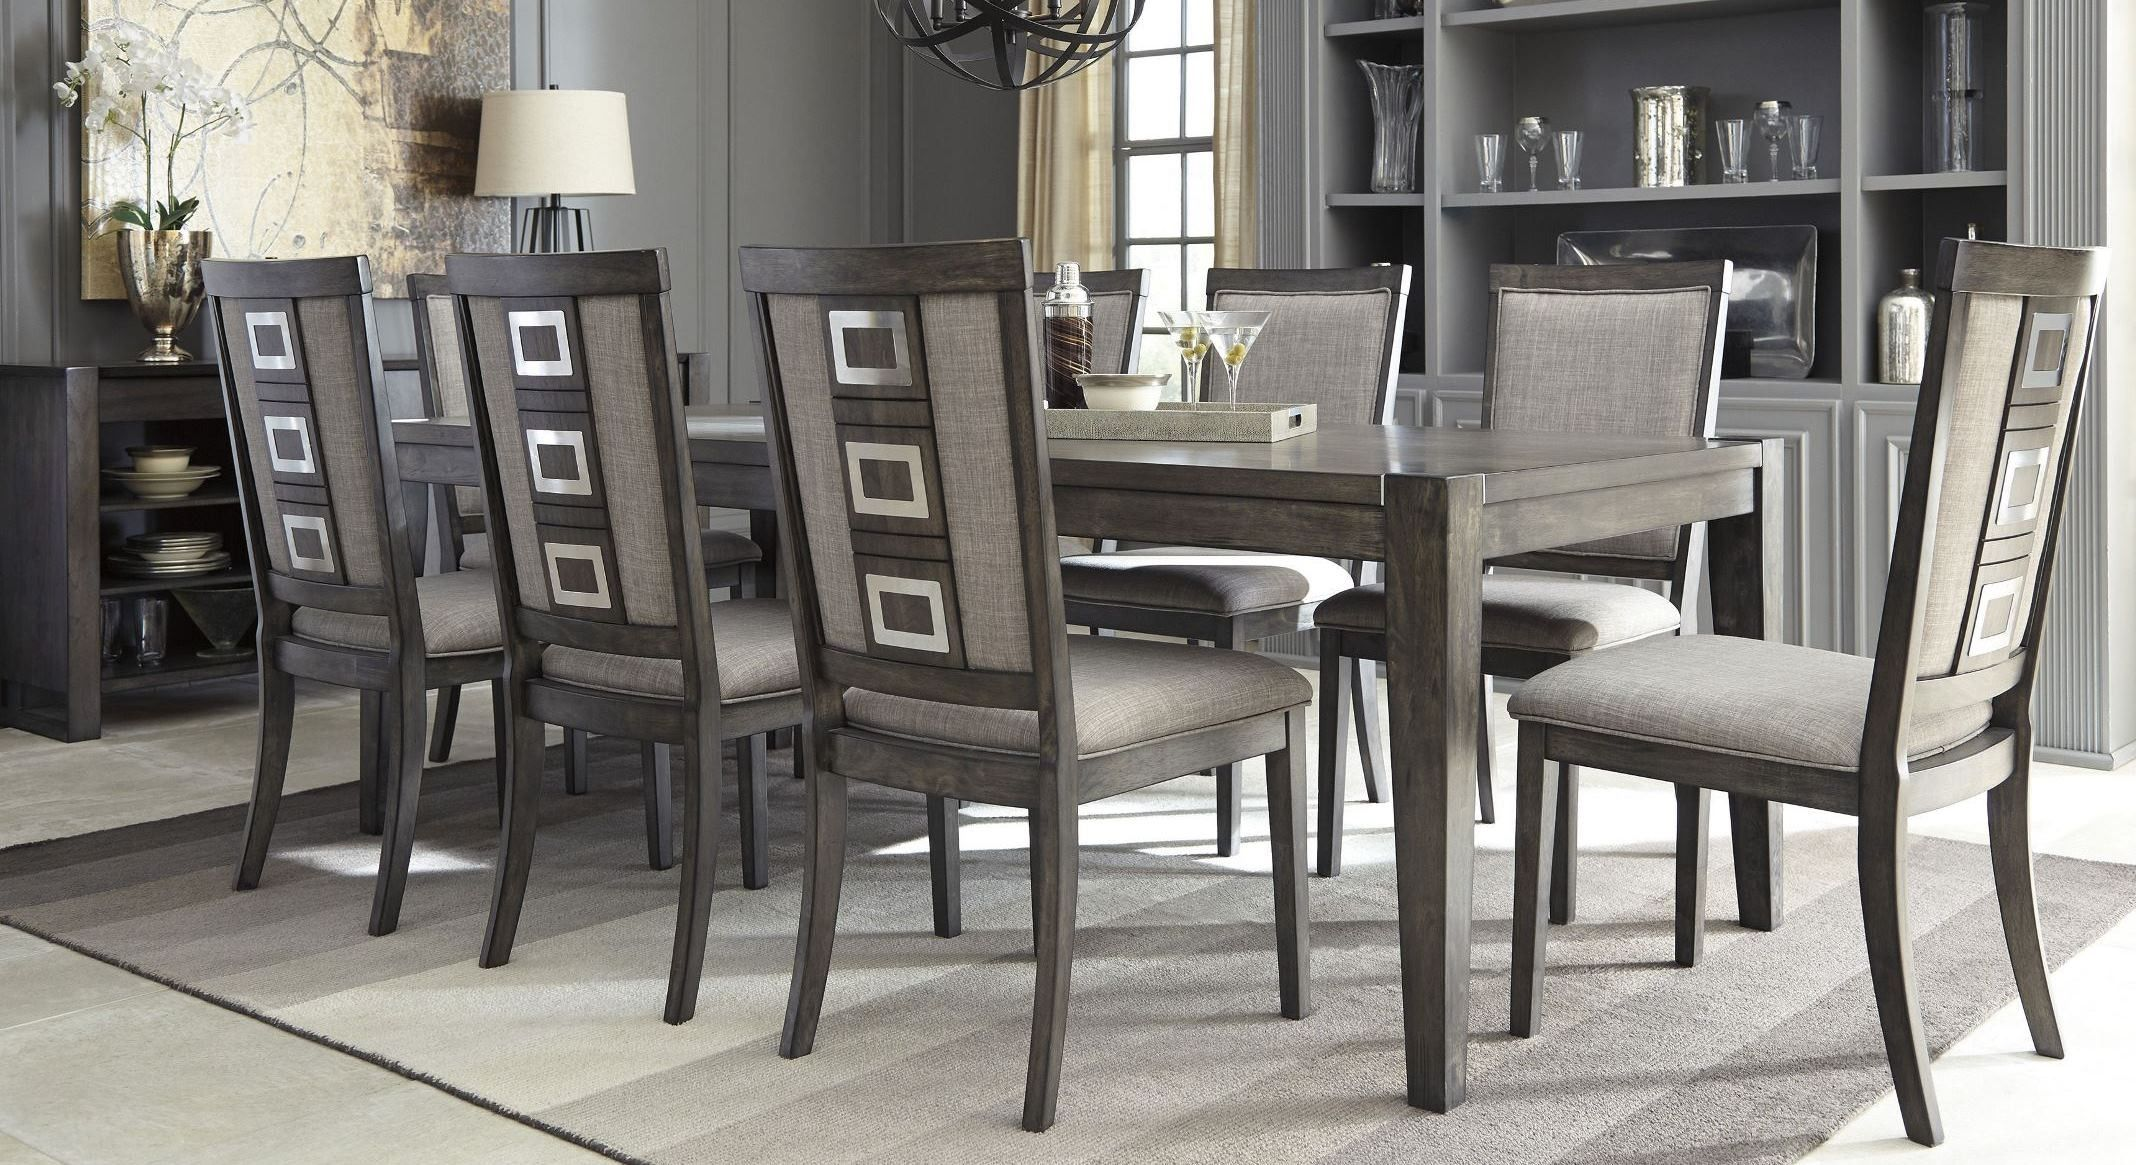 34+ Parkins rustic espresso rectangular dining room set Top